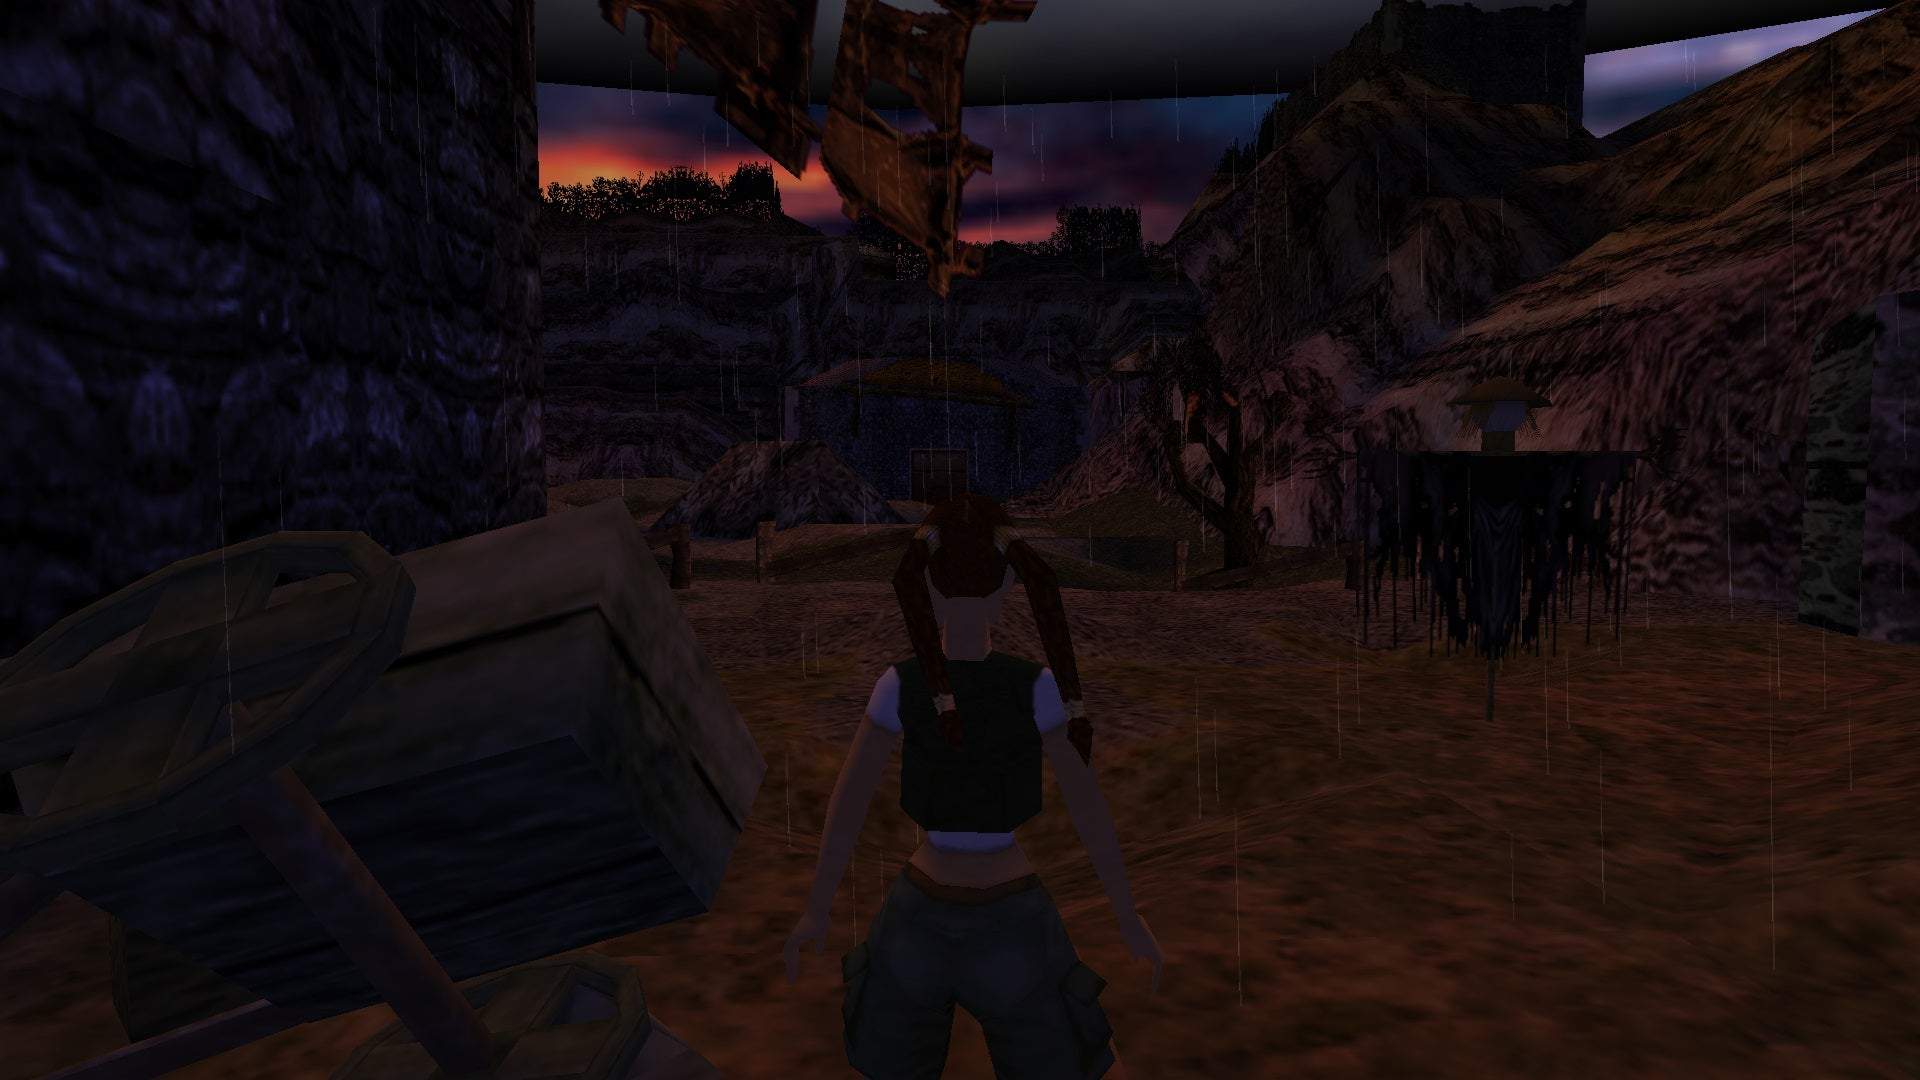 A screenshot from the Tomb Raider custom level called The Harp of Dagda